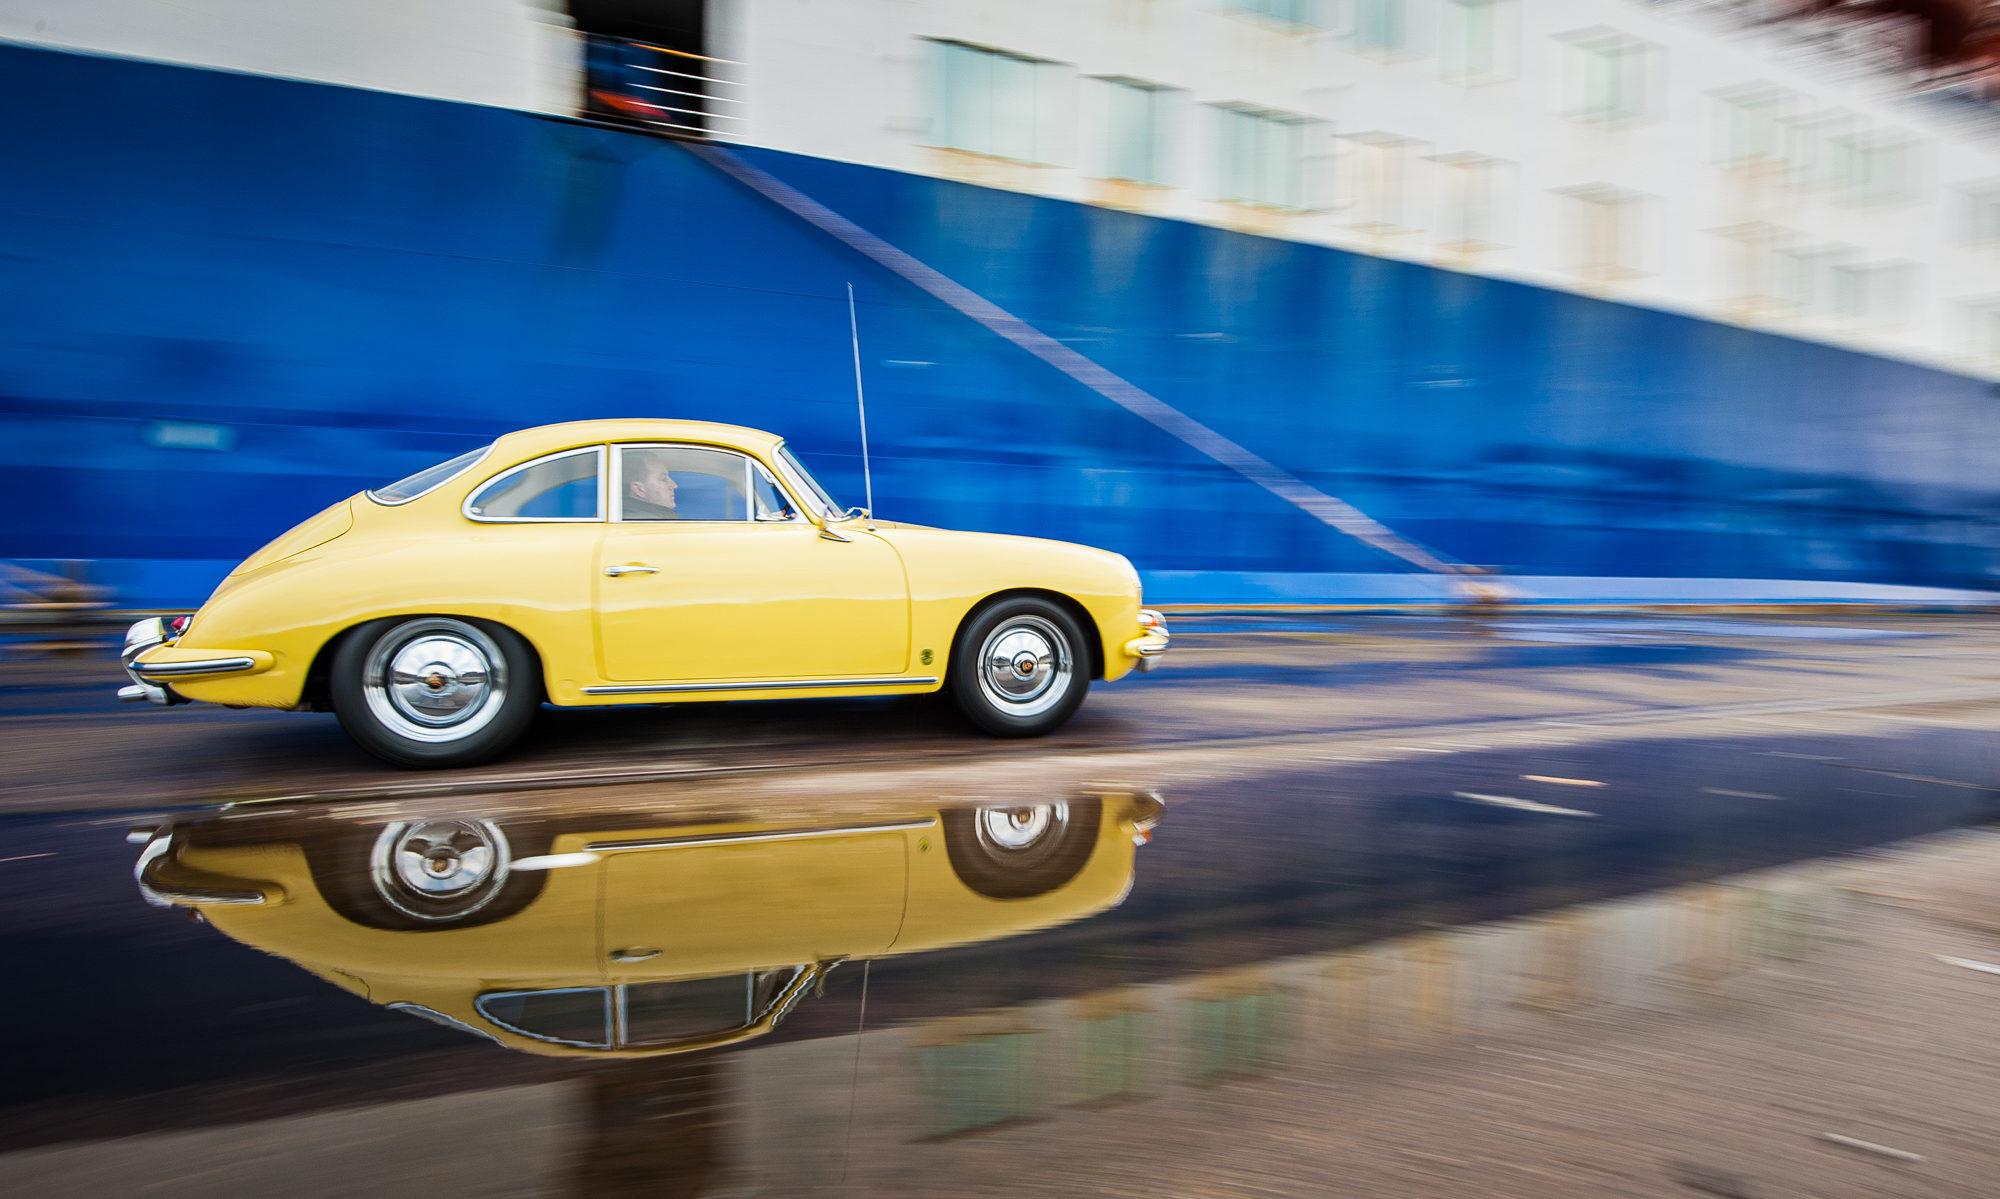 Edgewood Automotive